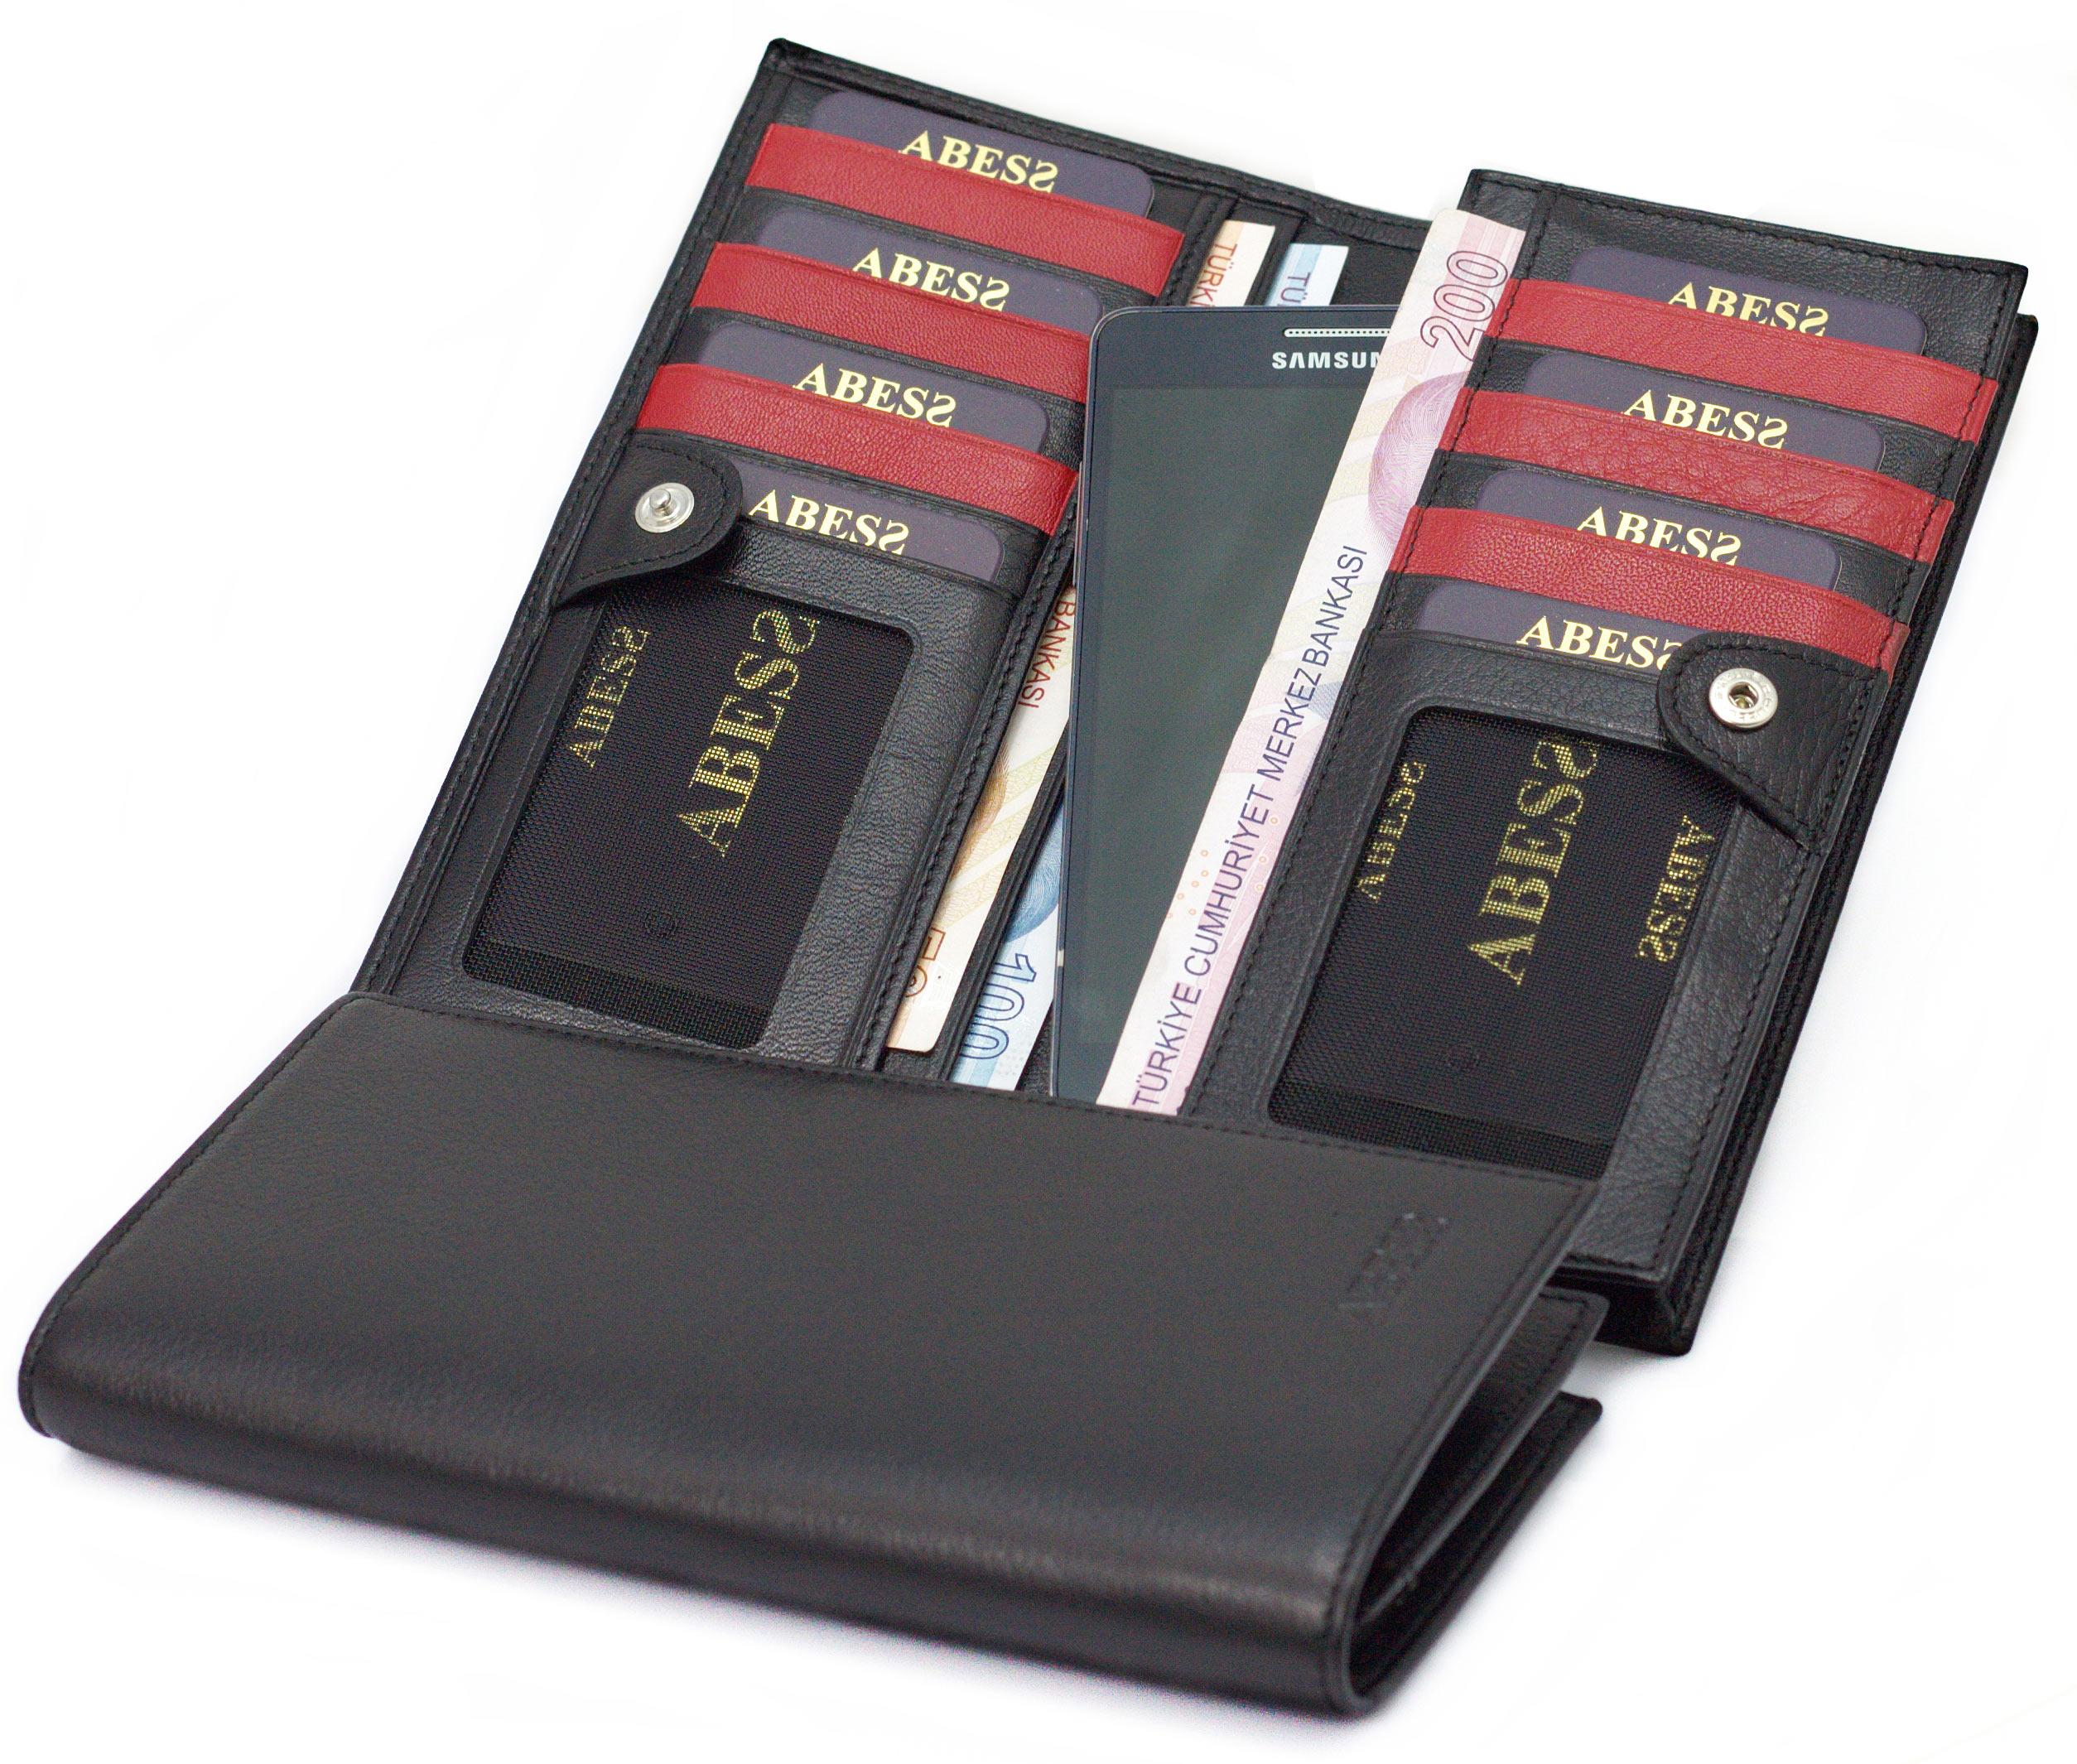 cd7f814840234 ABESS Cüzdan Kartlık , Telefon Bölmeli Lüks Gerçek Deri Cüzdan « ABESS